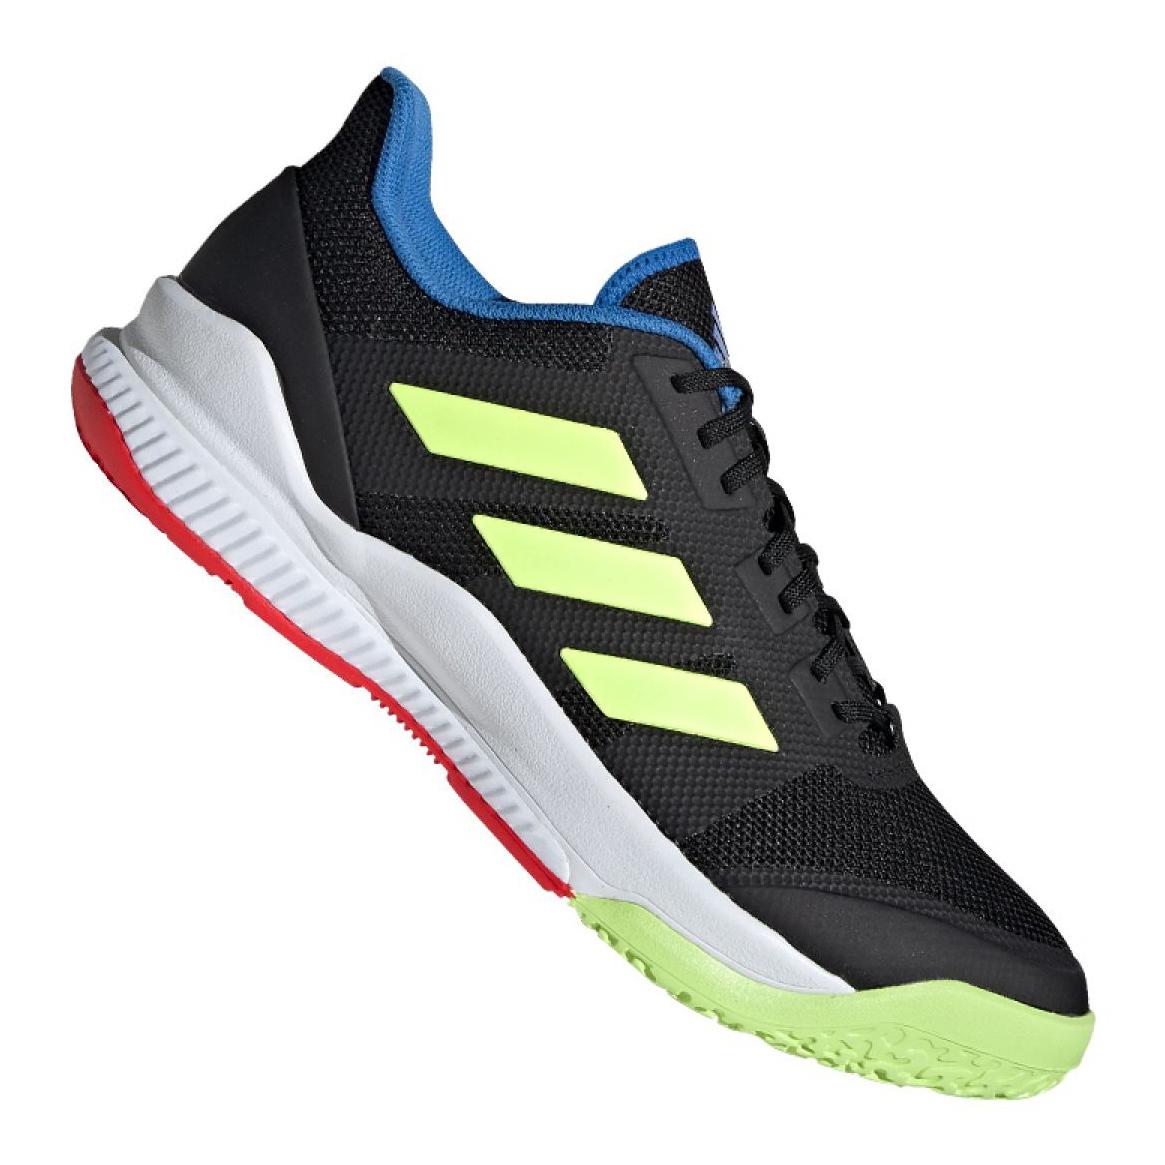 Adidas Stabil Bounce M BD7412 Schuhe schwarz schwarz